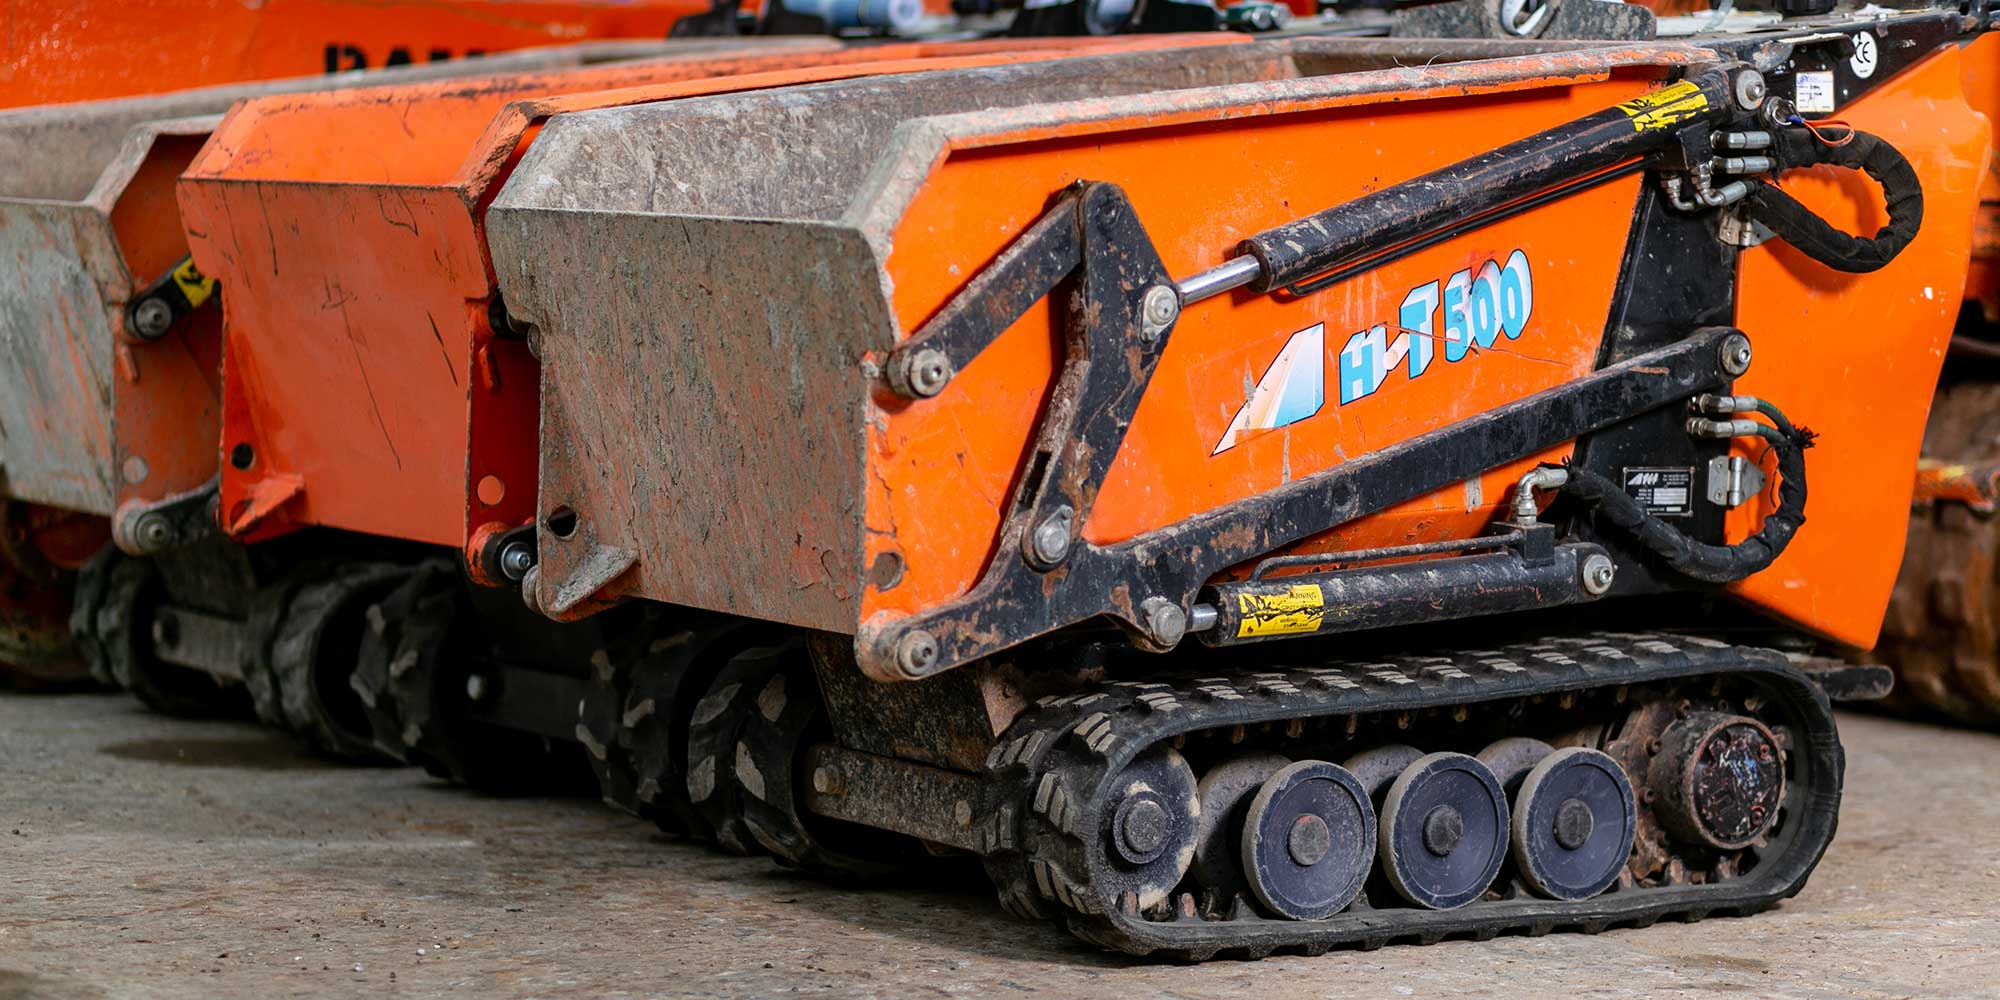 Hi-T500 mini tracked dumper